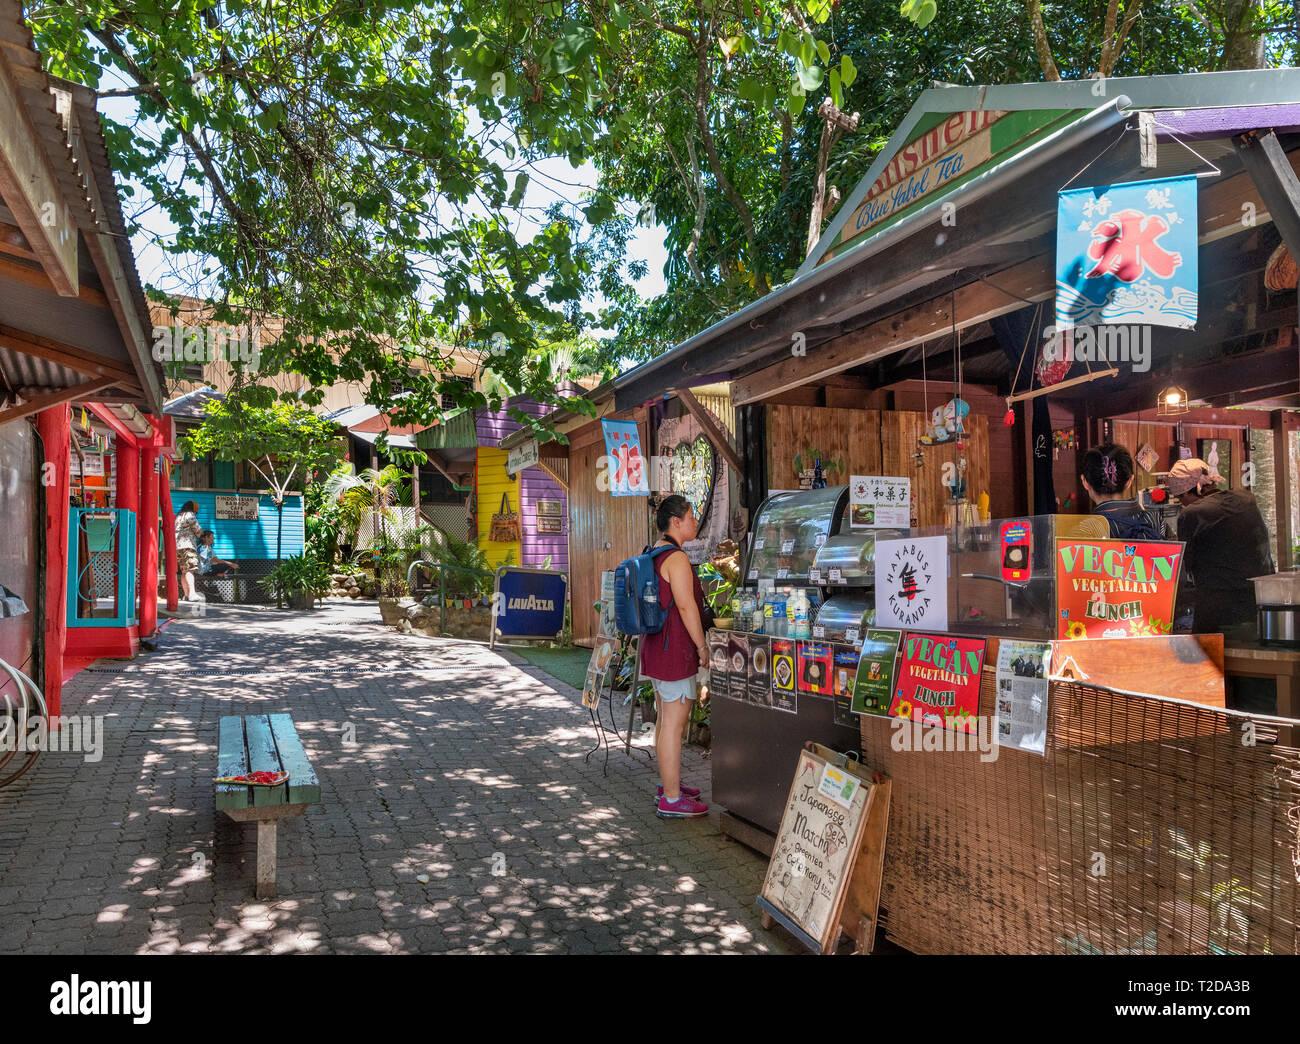 Food and drink stall at Kuranda Original Rainforest Markets, Kuranda, Atherton Tablelands, Far North Queensland, Australia - Stock Image